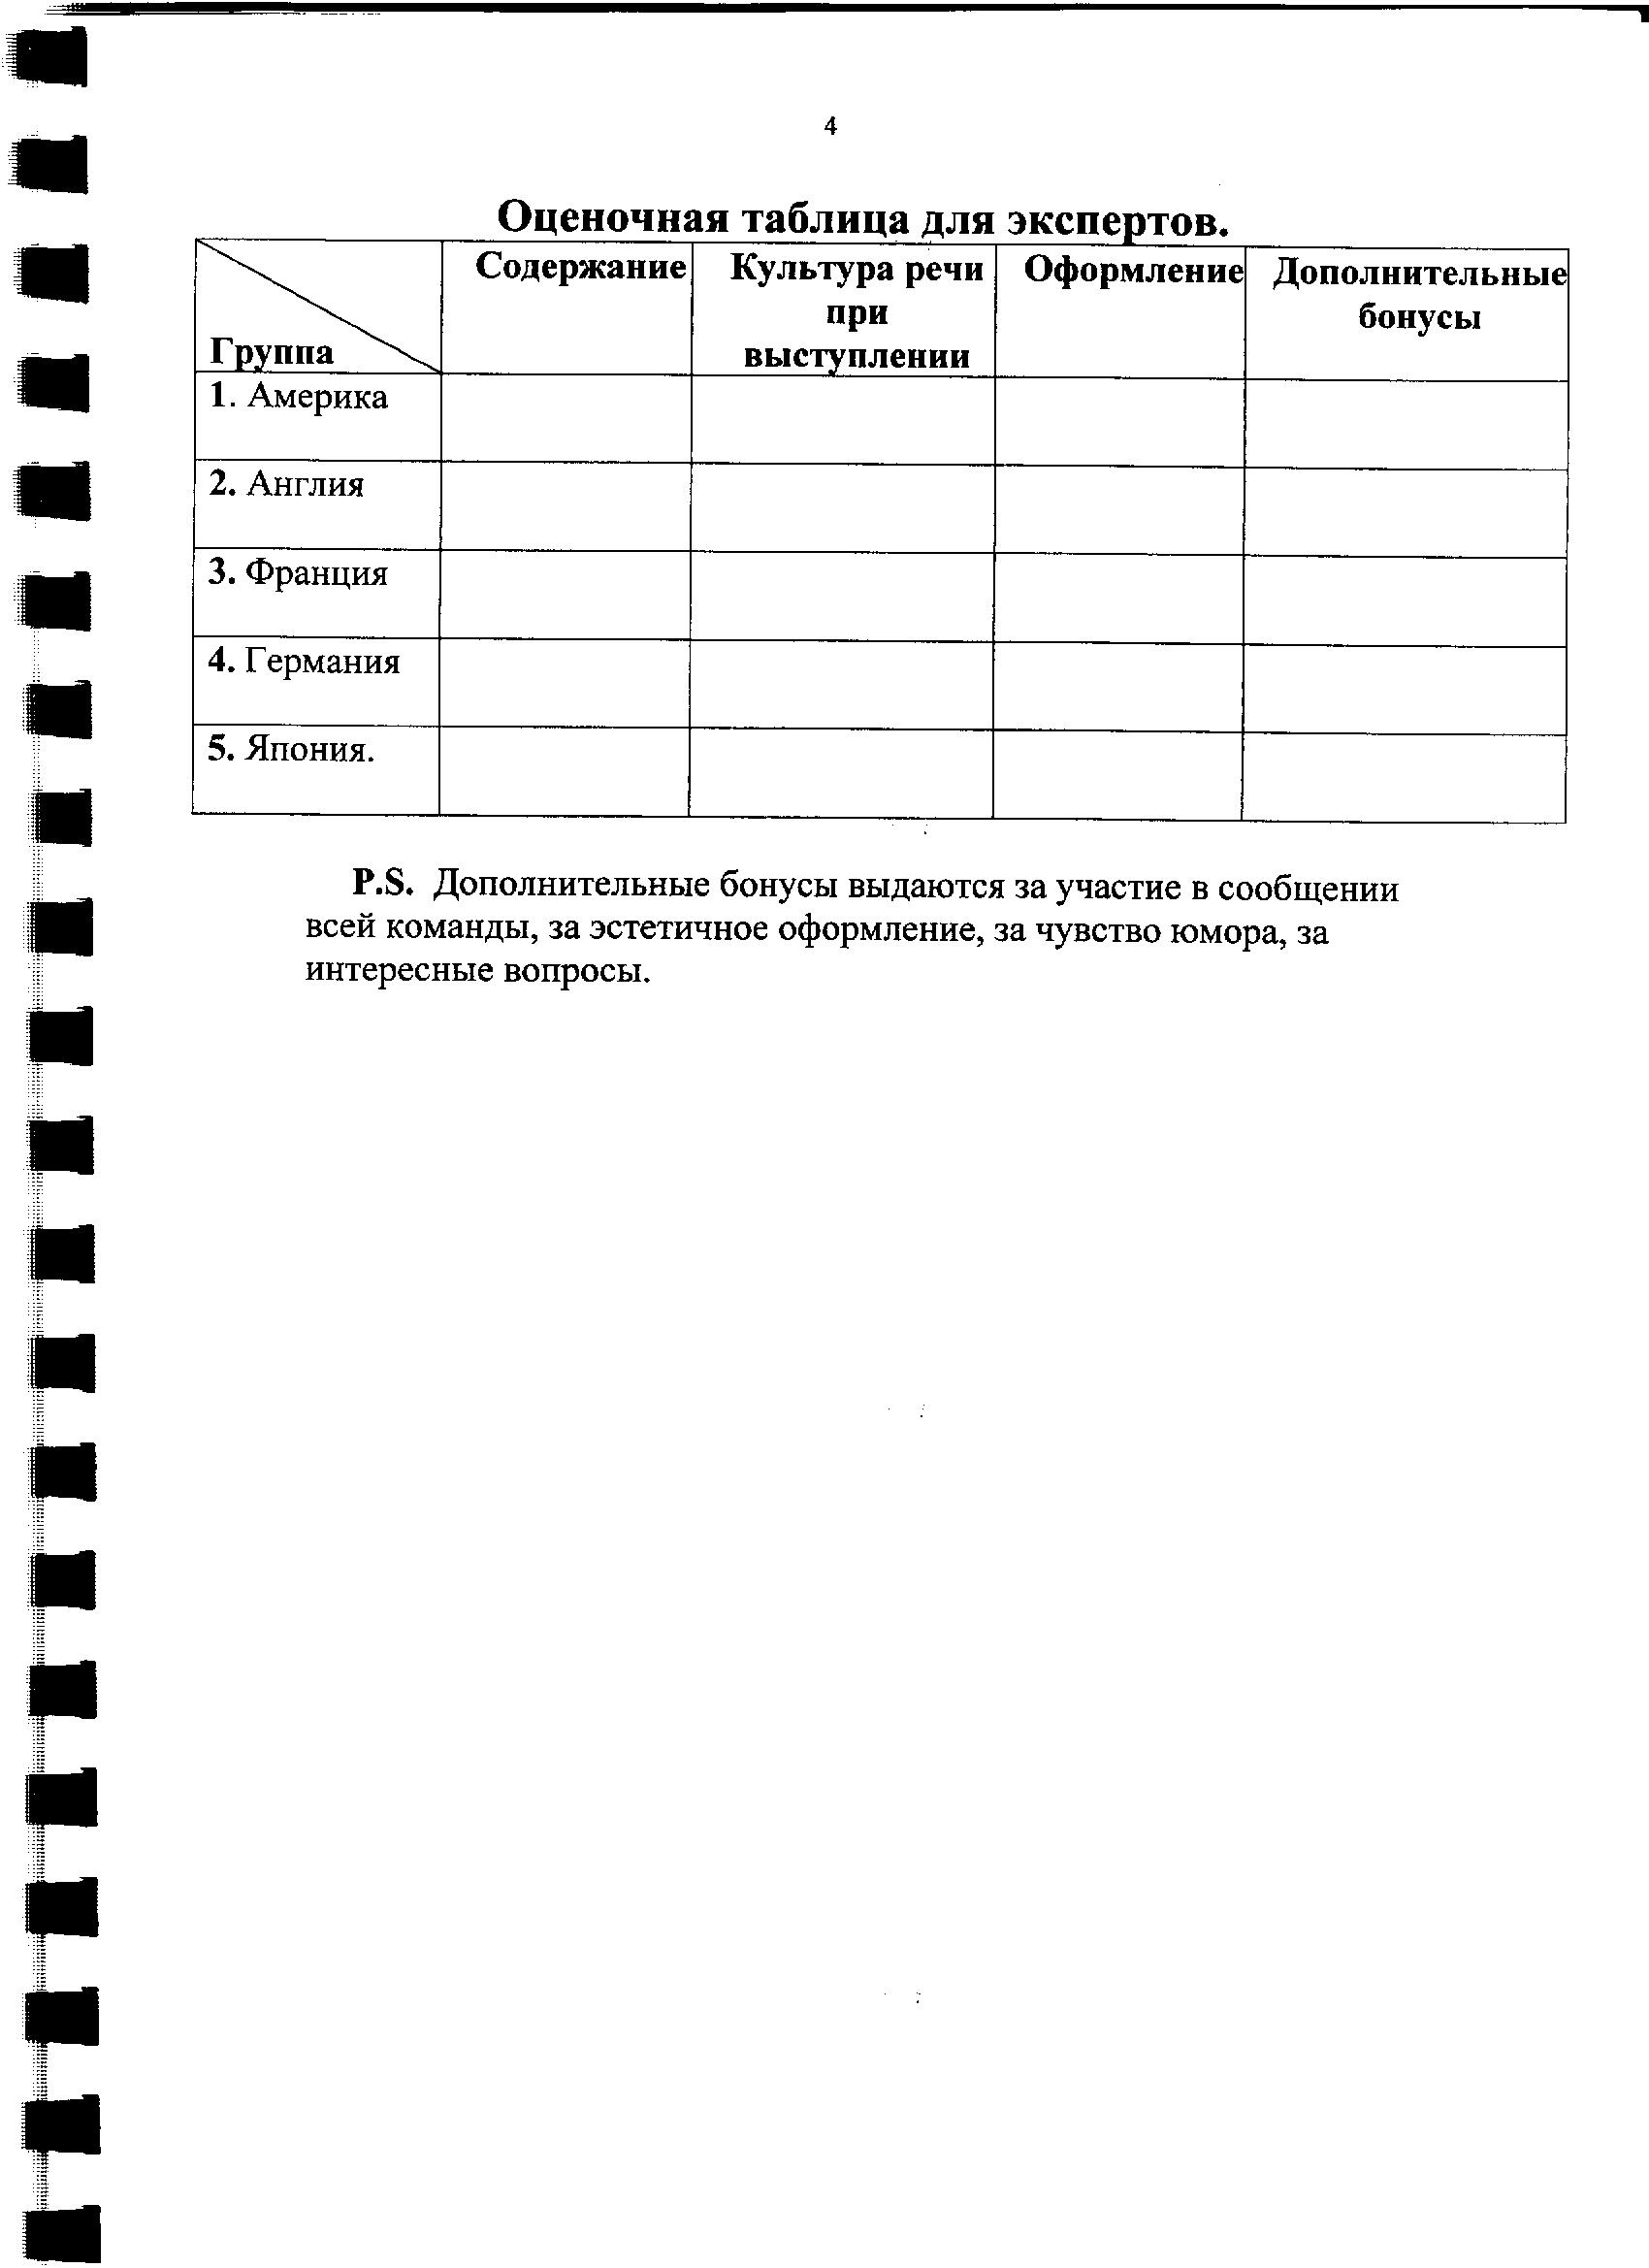 C:\Documents and Settings\Николай\Мои документы\Мои рисунки\Урок путешествие5.bmp